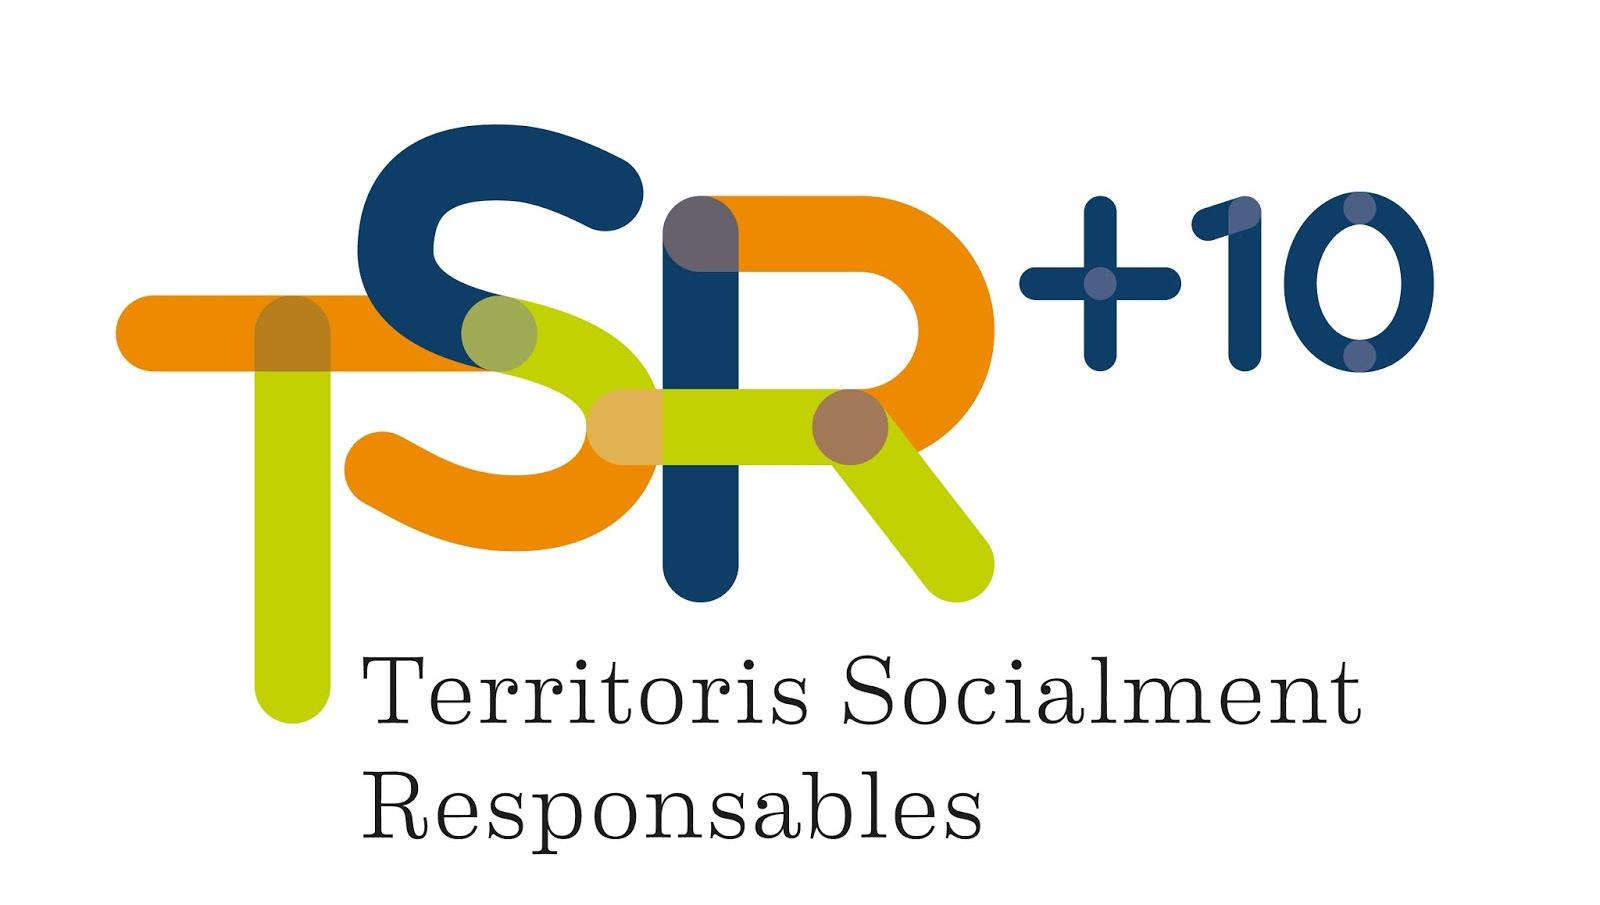 Territoris Socialment Responsables - EBA Vallcarca